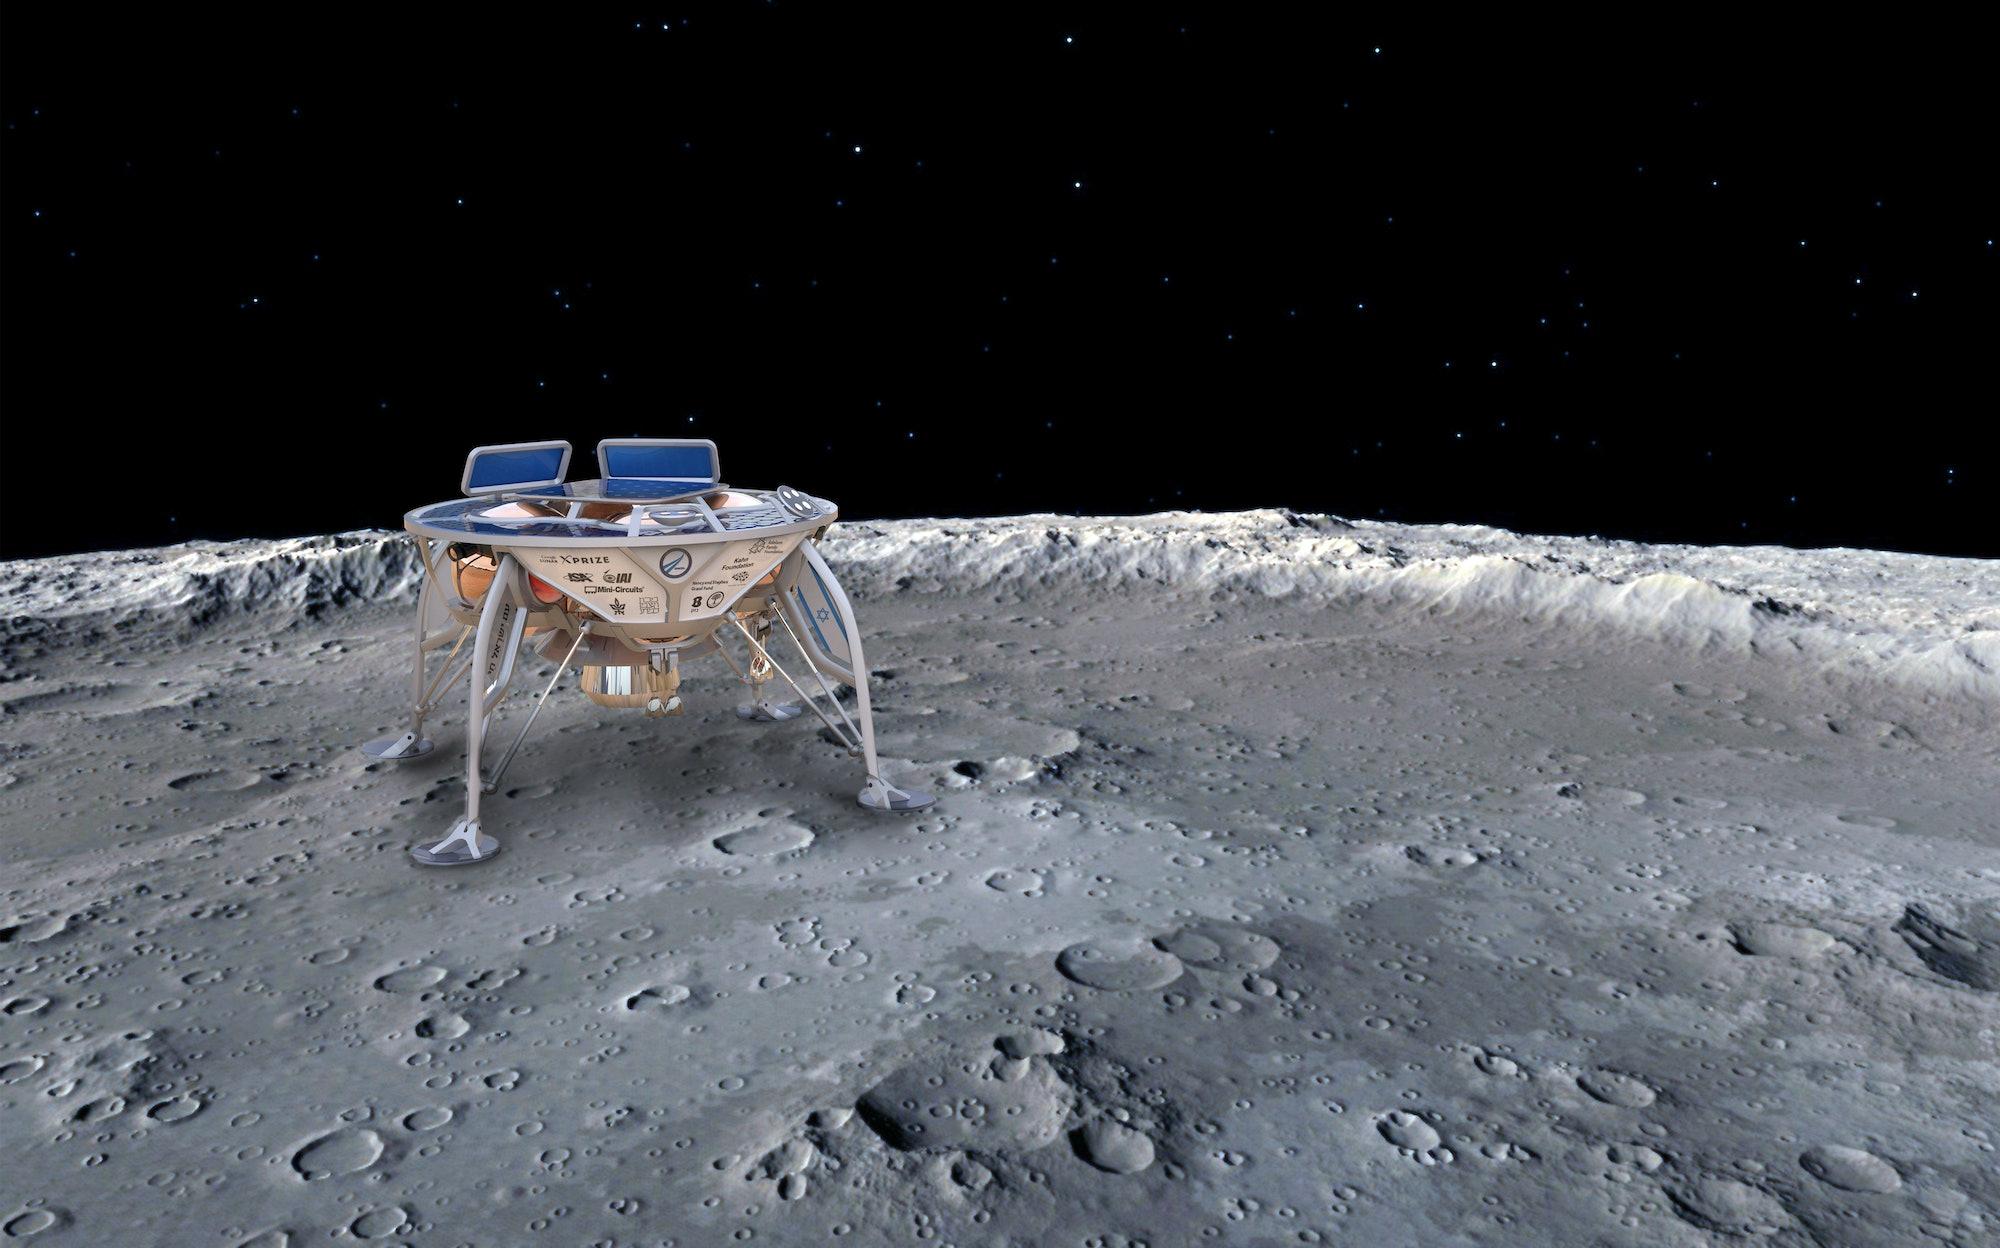 Artist's concept of Beresheet on the lunar surface.